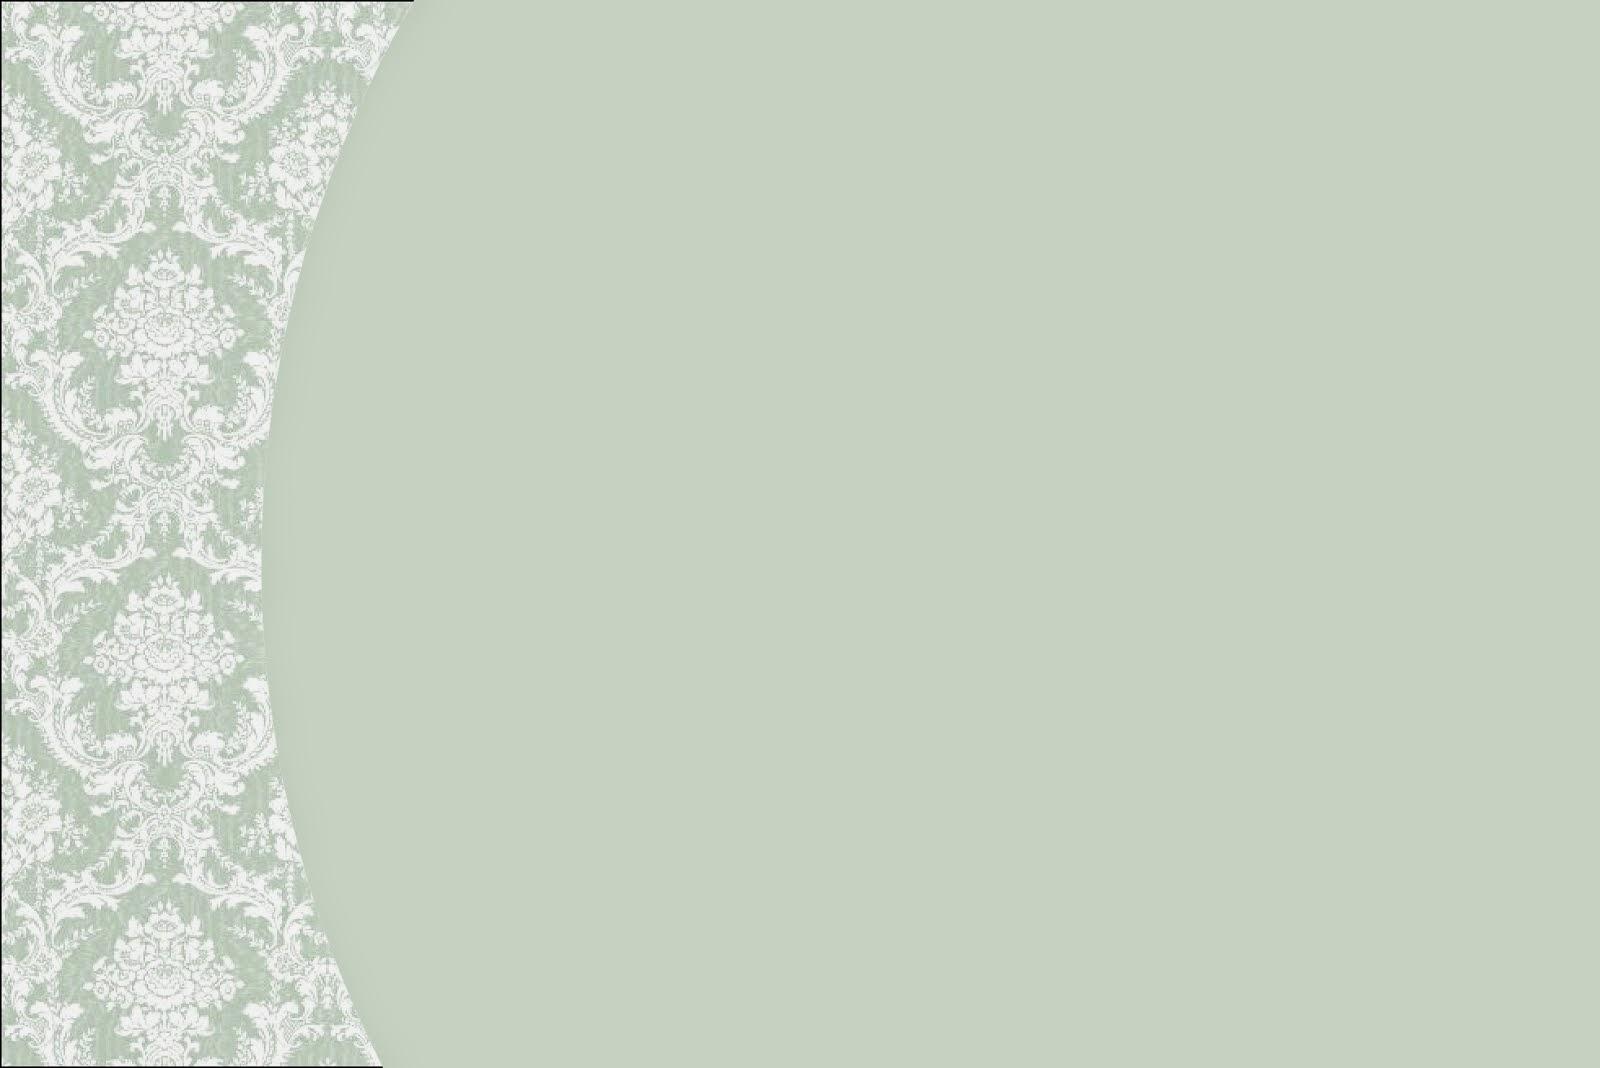 Provenzal en gris verdoso invitaciones para imprimir for Gris verdoso pared